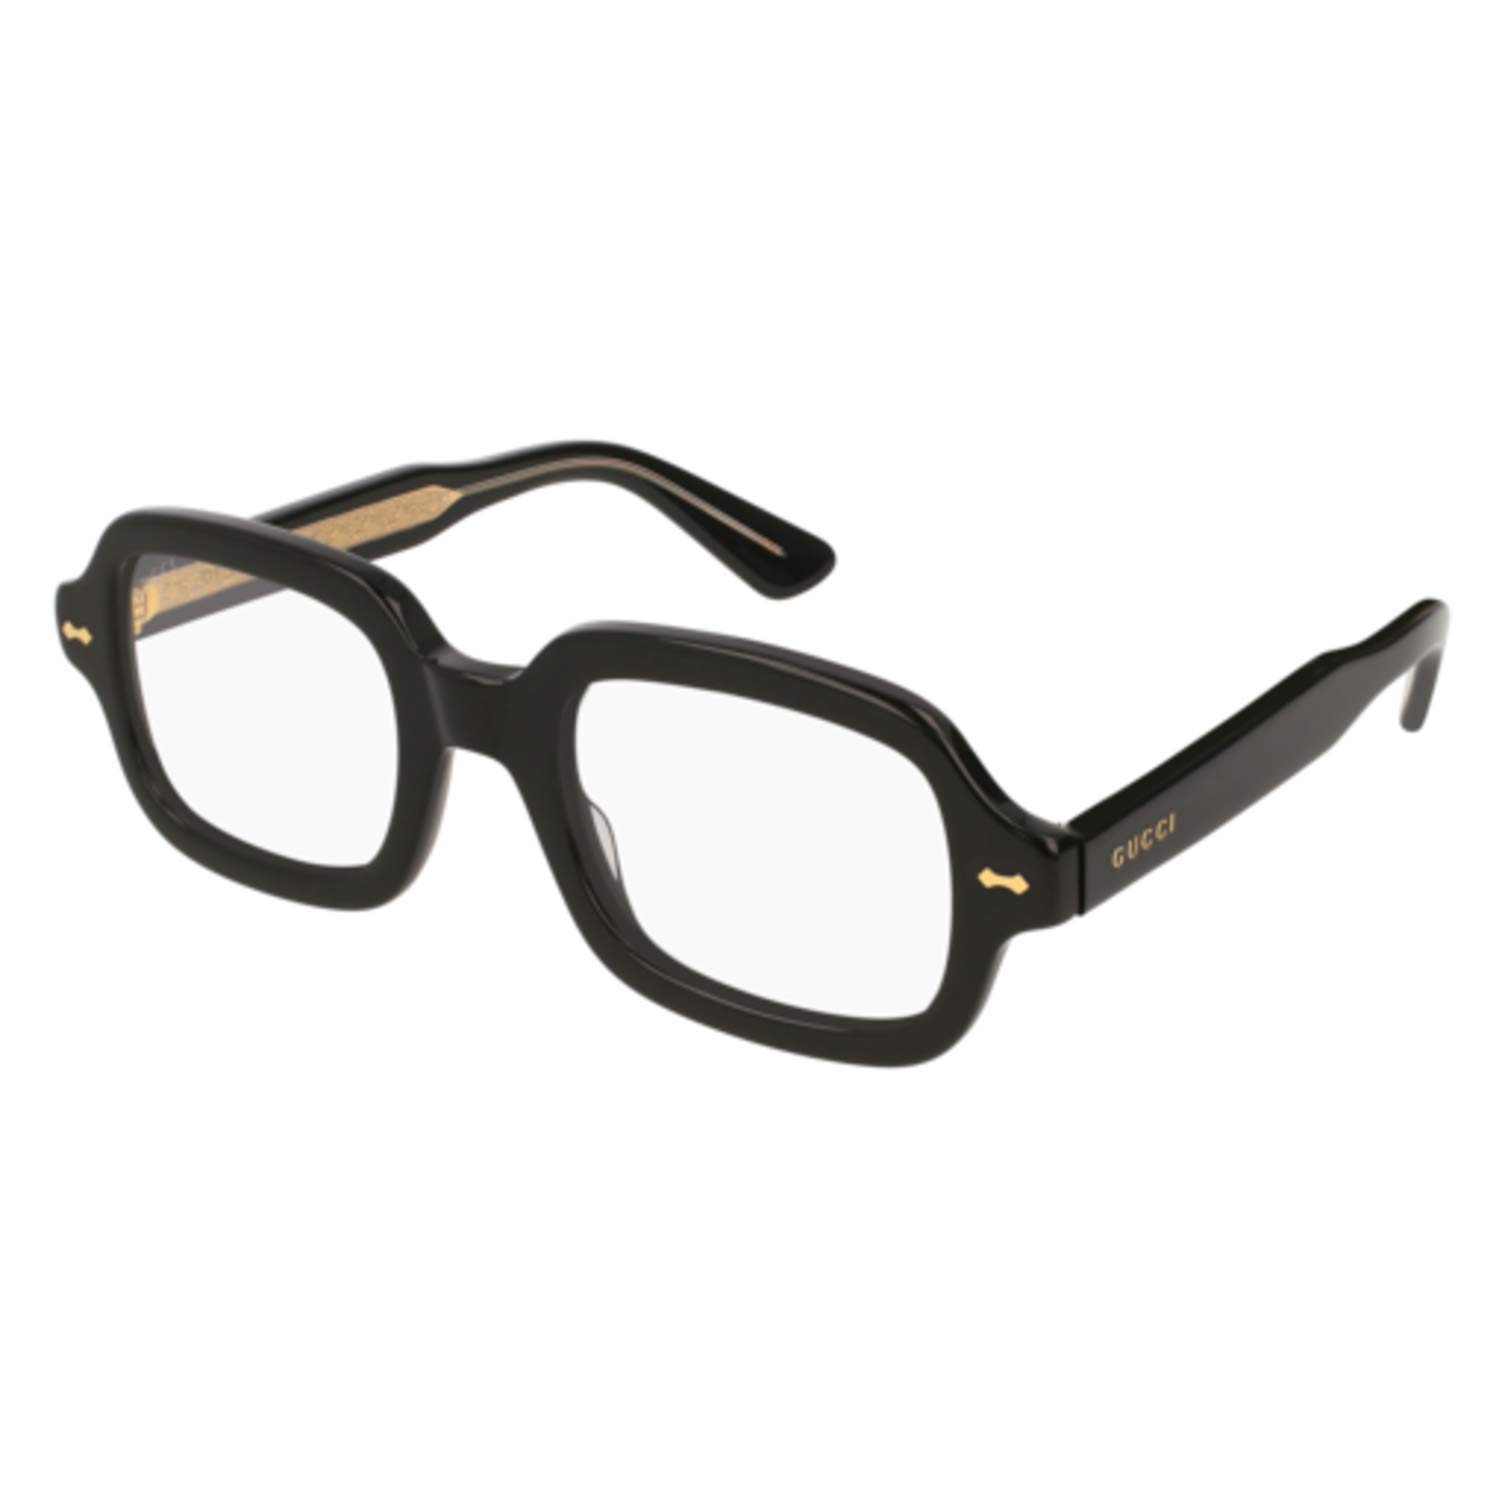 Gucci GG0072S 001 Eyeglasses